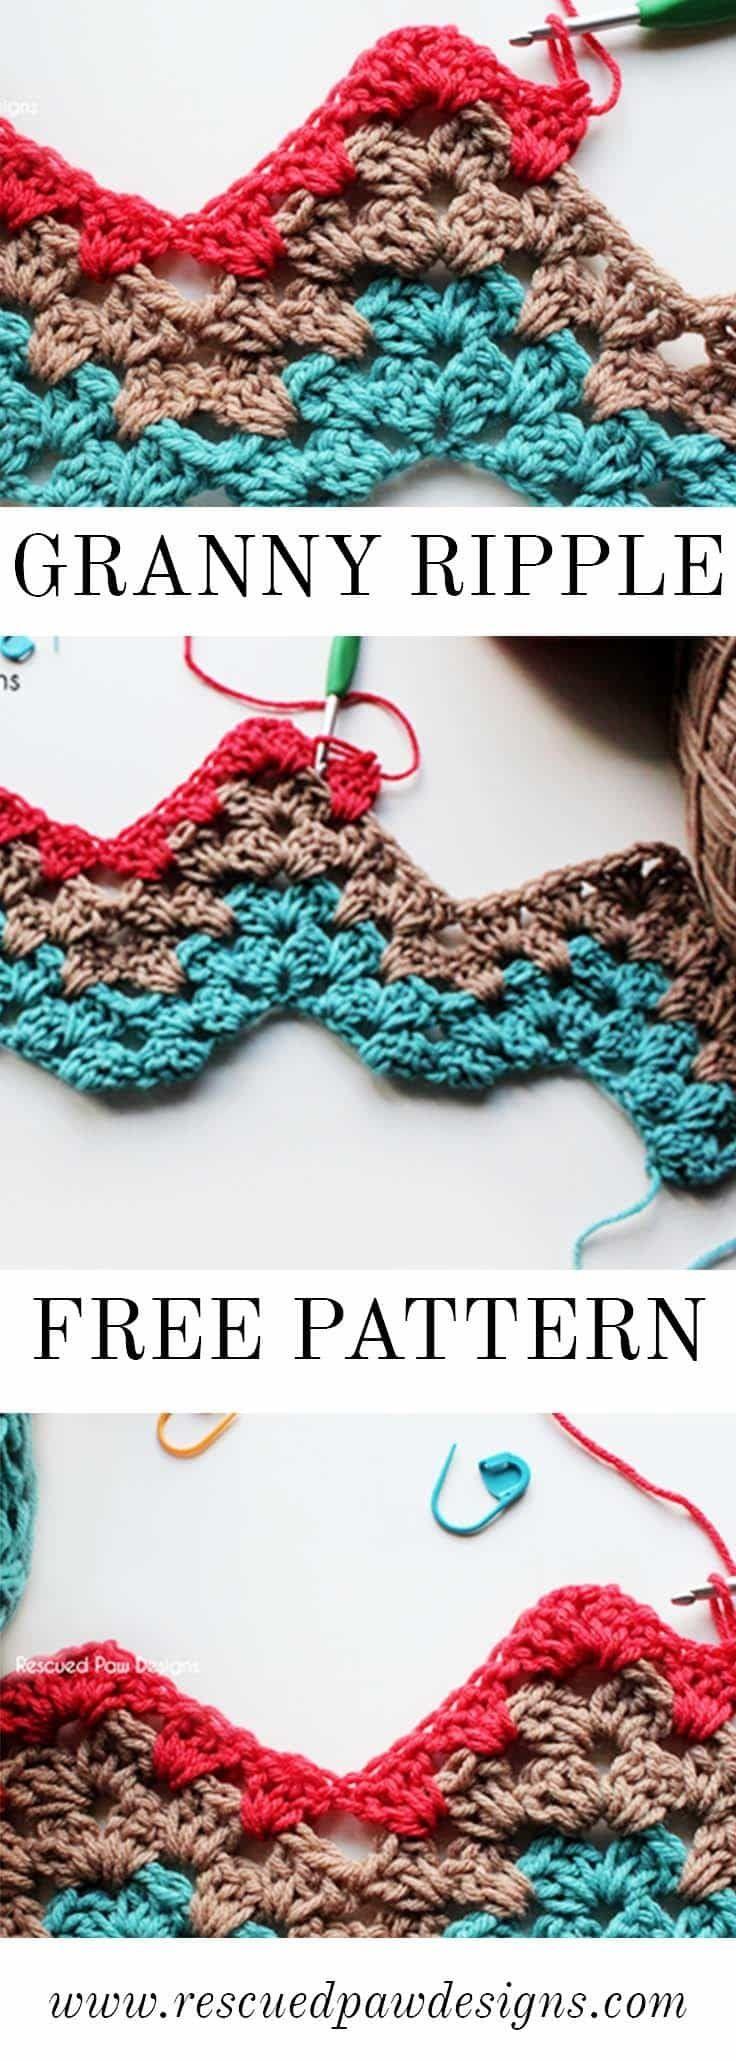 Granny Ripple Crochet Pattern | Ganchillo, Tejido y Puntadas